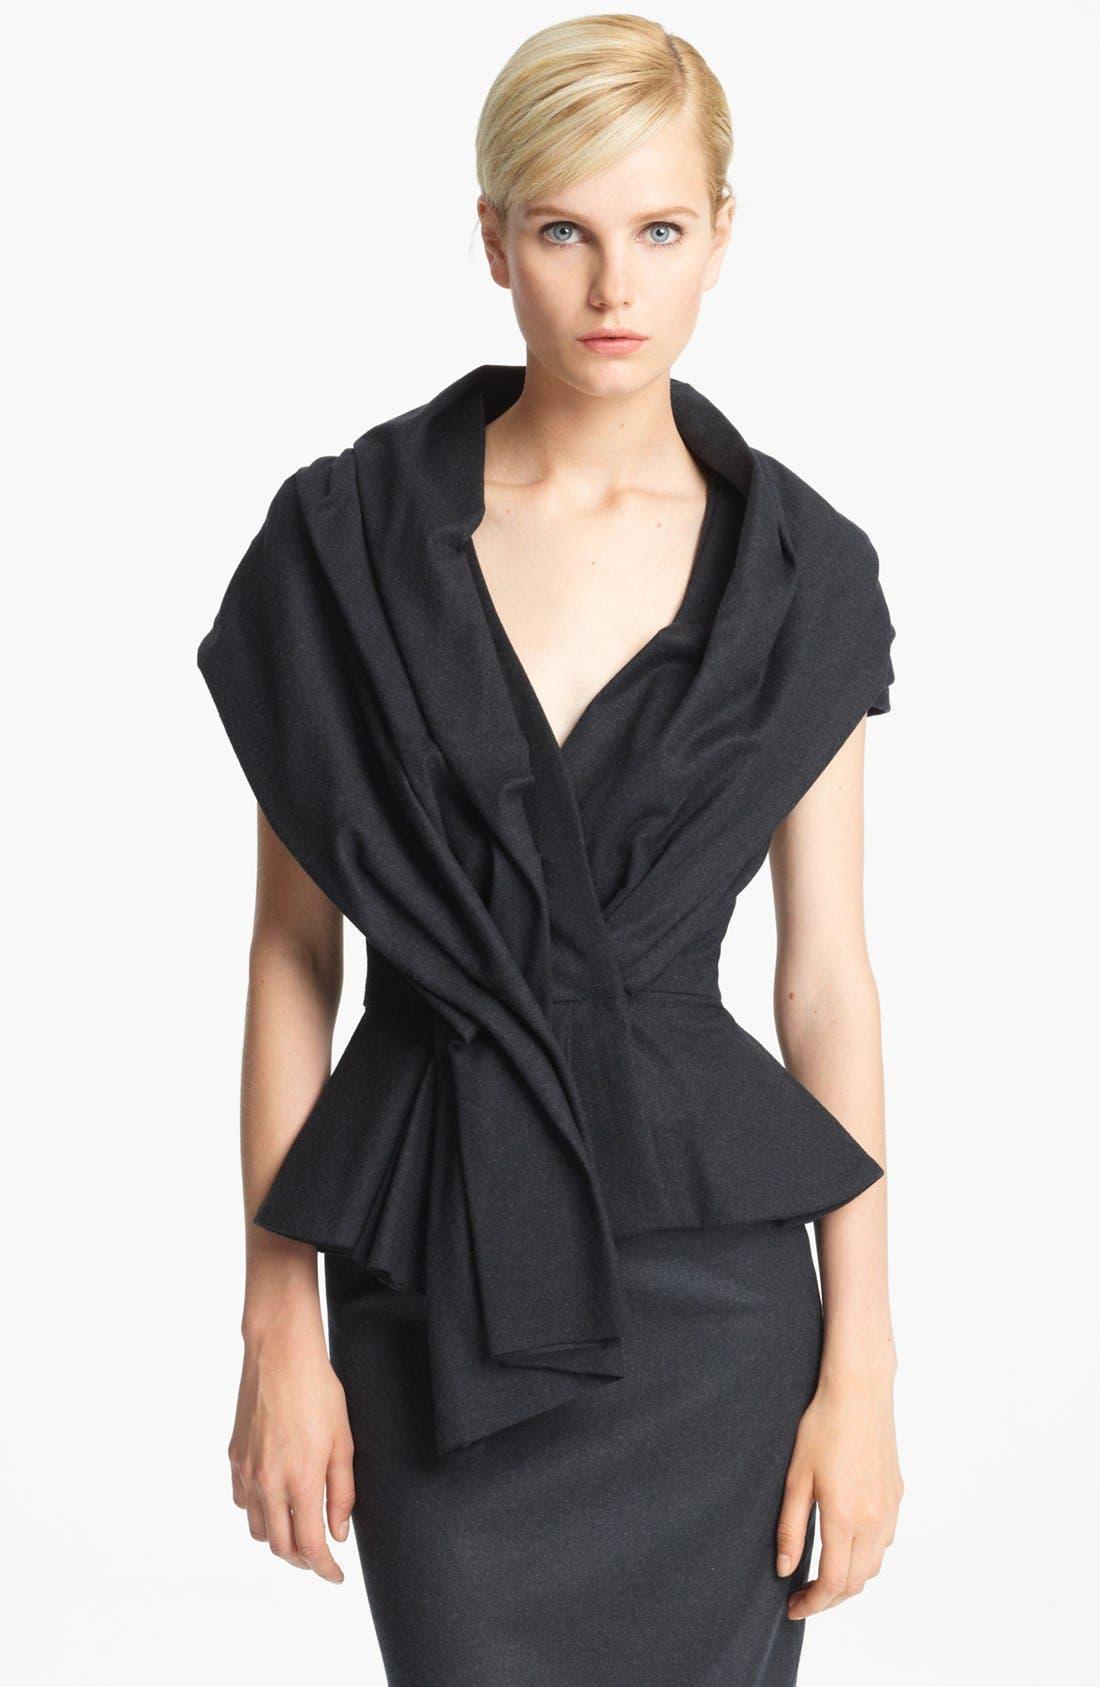 Alternate Image 1 Selected - Oscar de la Renta 'Skyline' Short Sleeve Flannel Jacket